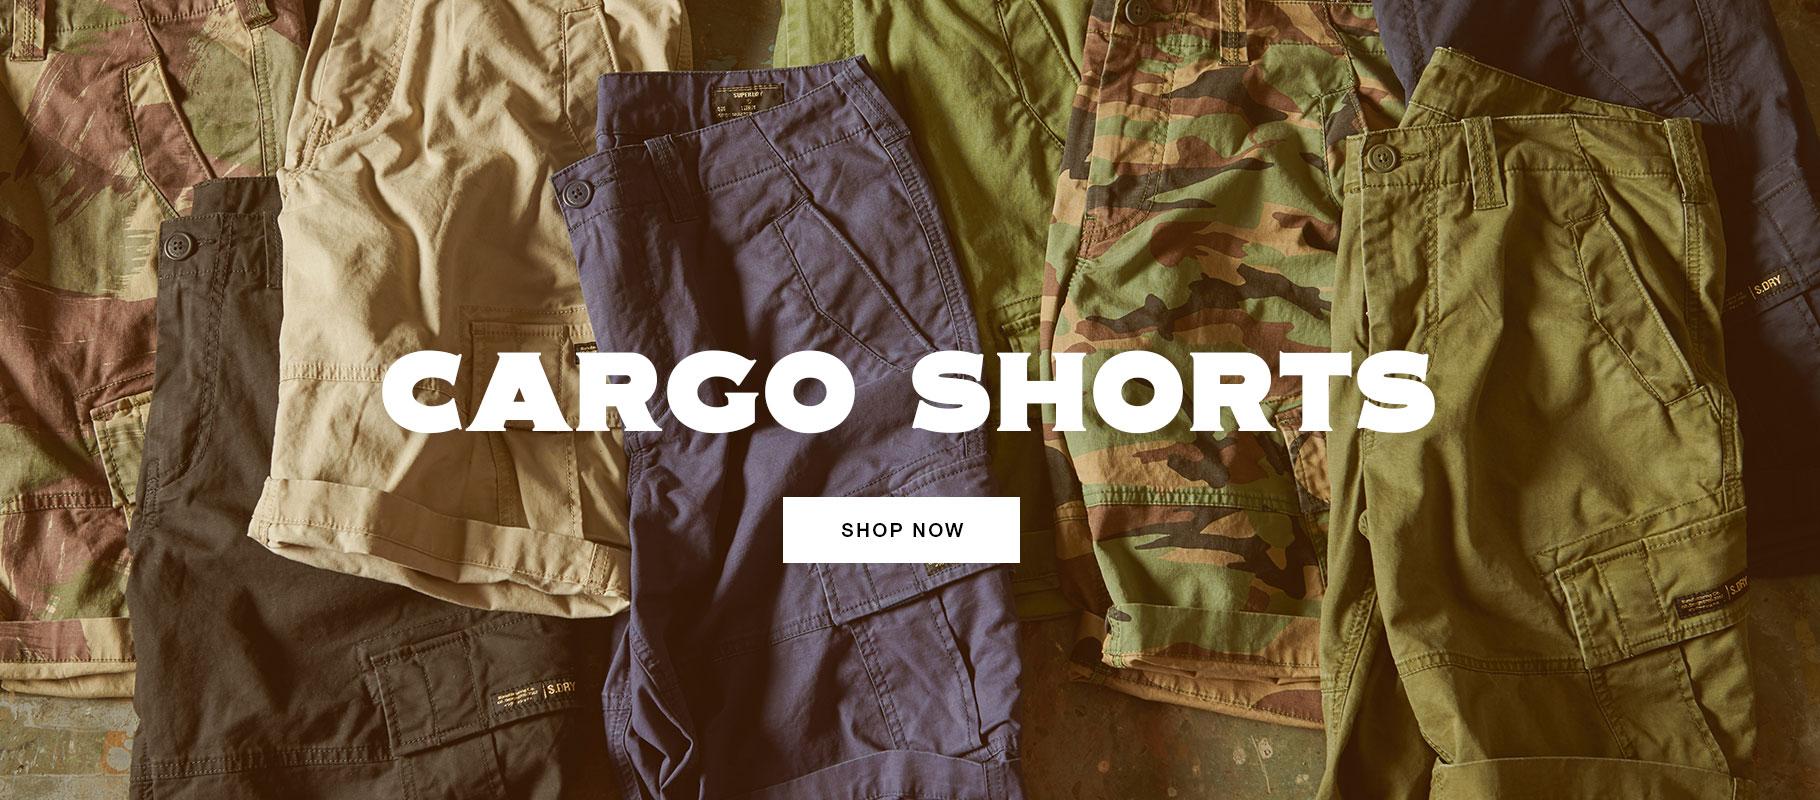 1820x800-Cargo-Shorts